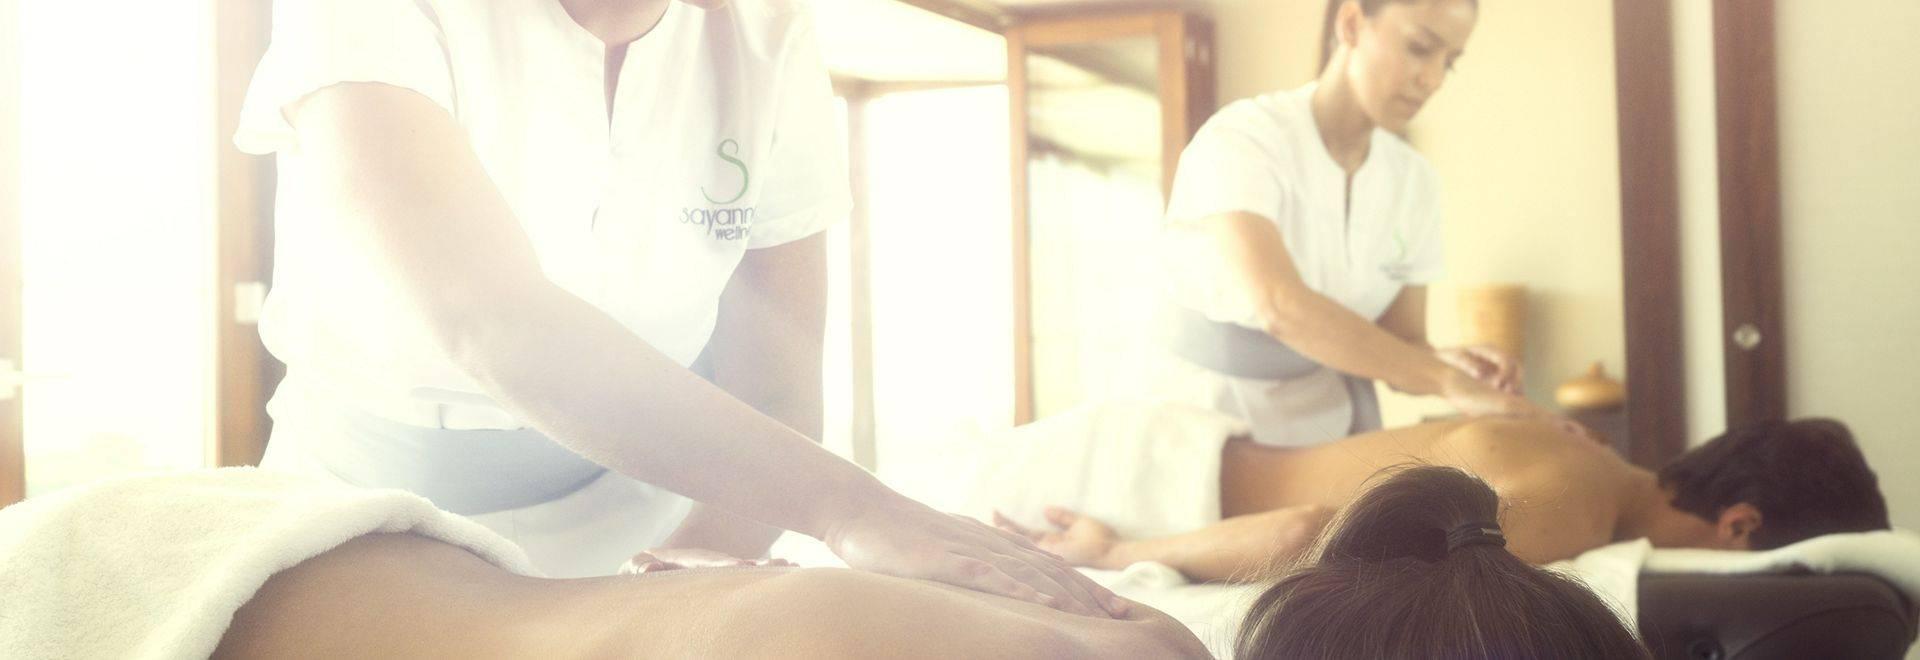 Epic-Sana-Spa-Massage-2.jpg